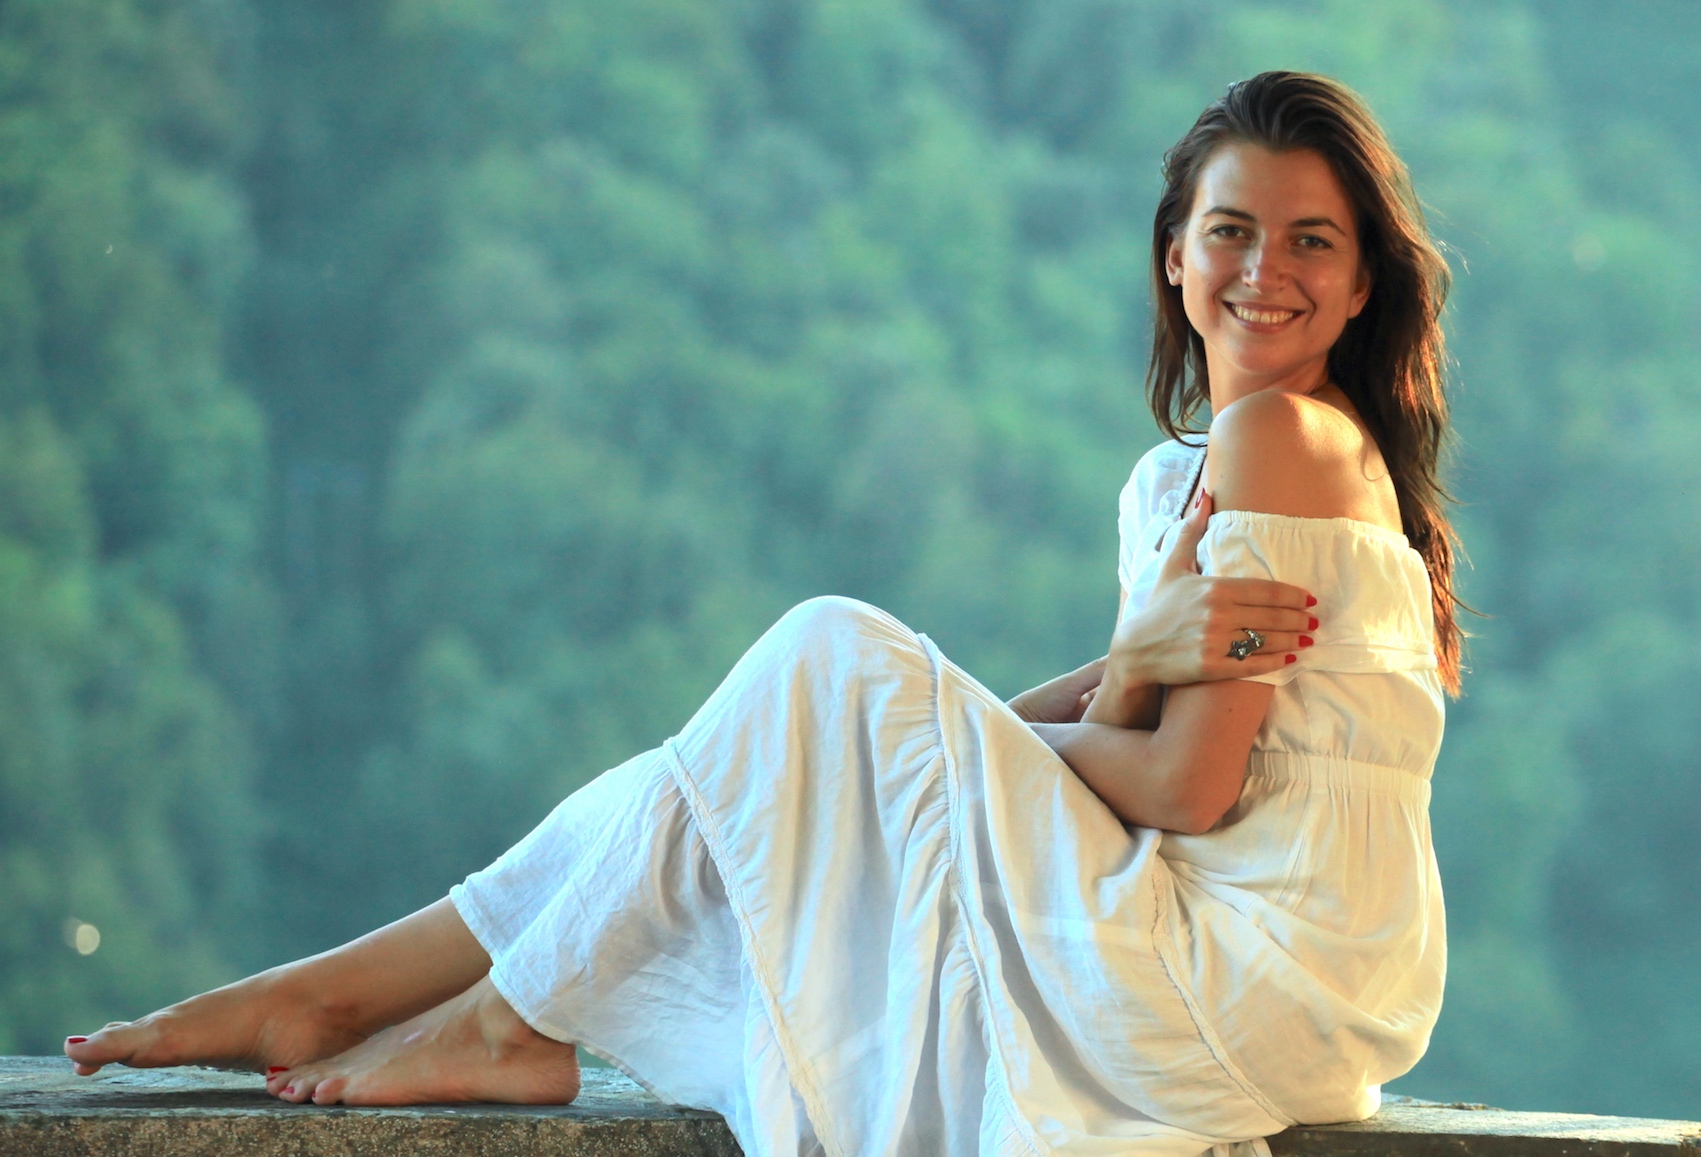 Katerina Kovanji, chanteuse mezzo soprano : talentueuse et belle !